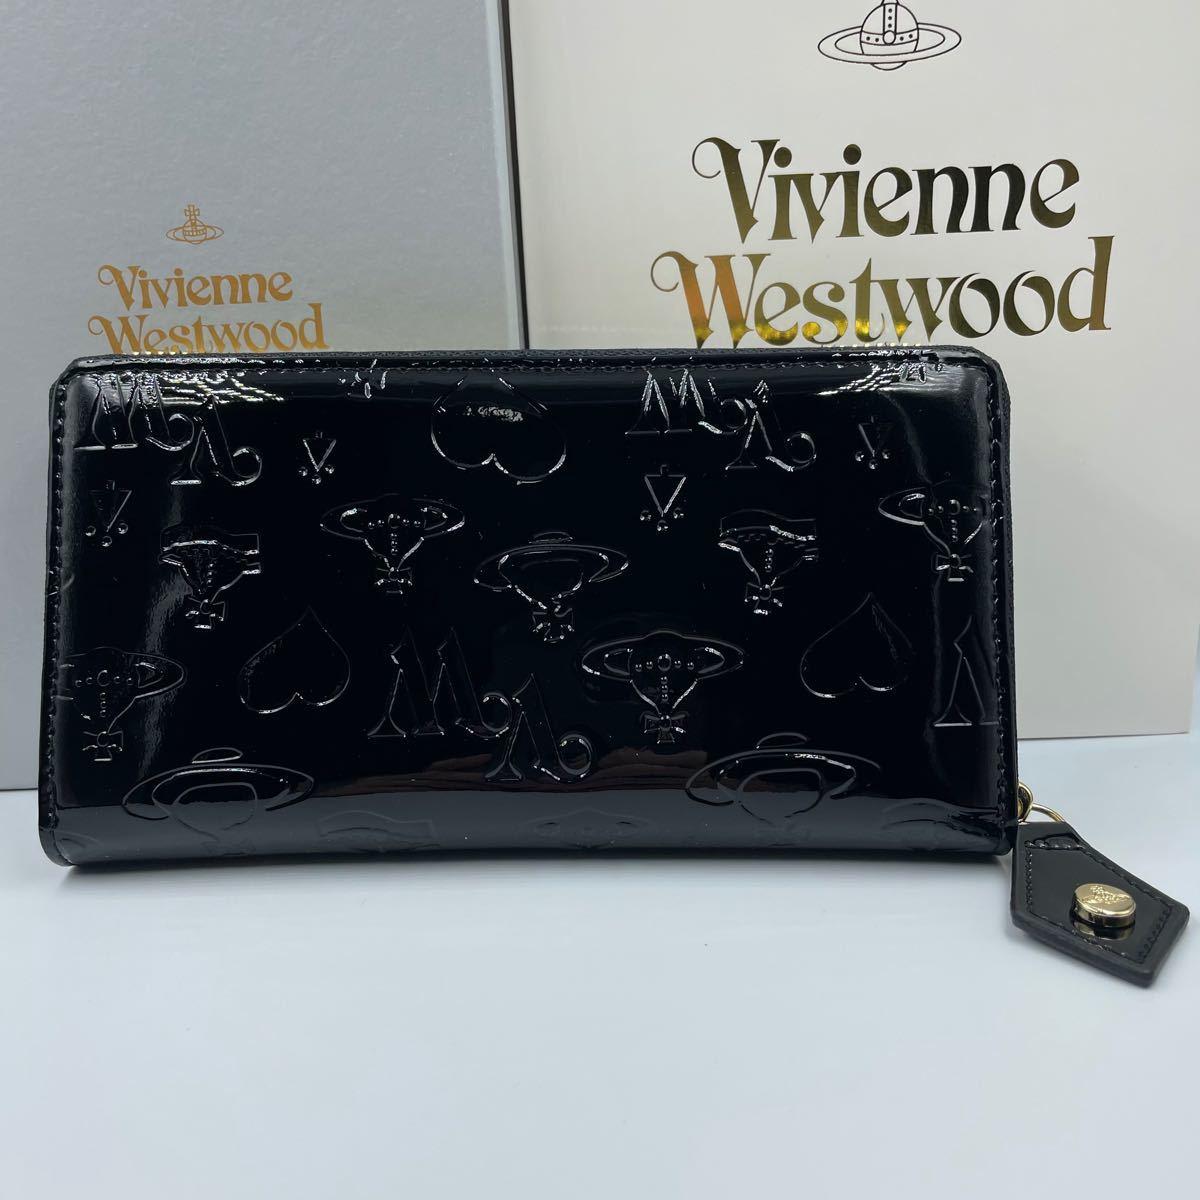 Vivienne Westwood ヴィヴィアンウエストウッド 長財布 【返金保証付き】